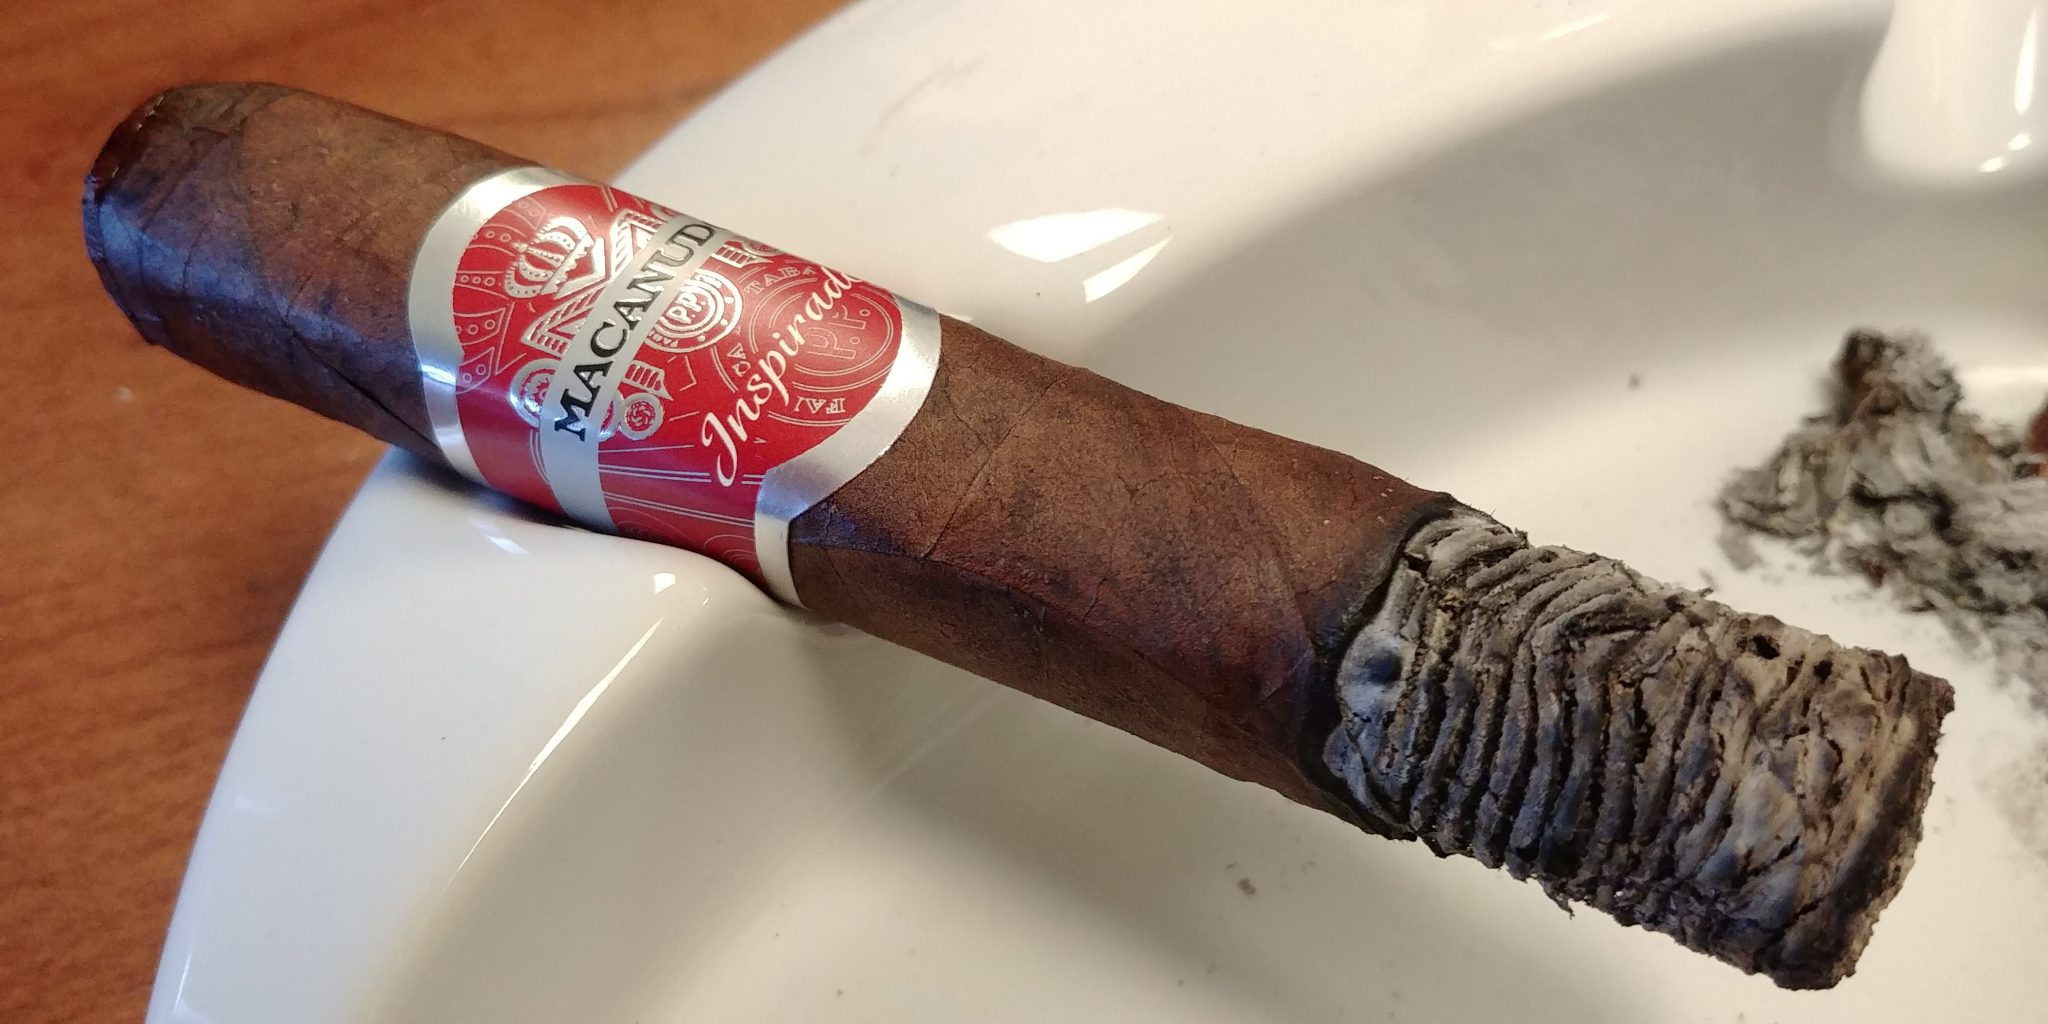 Macanudo Inspirado Red cigar review by John Pullo